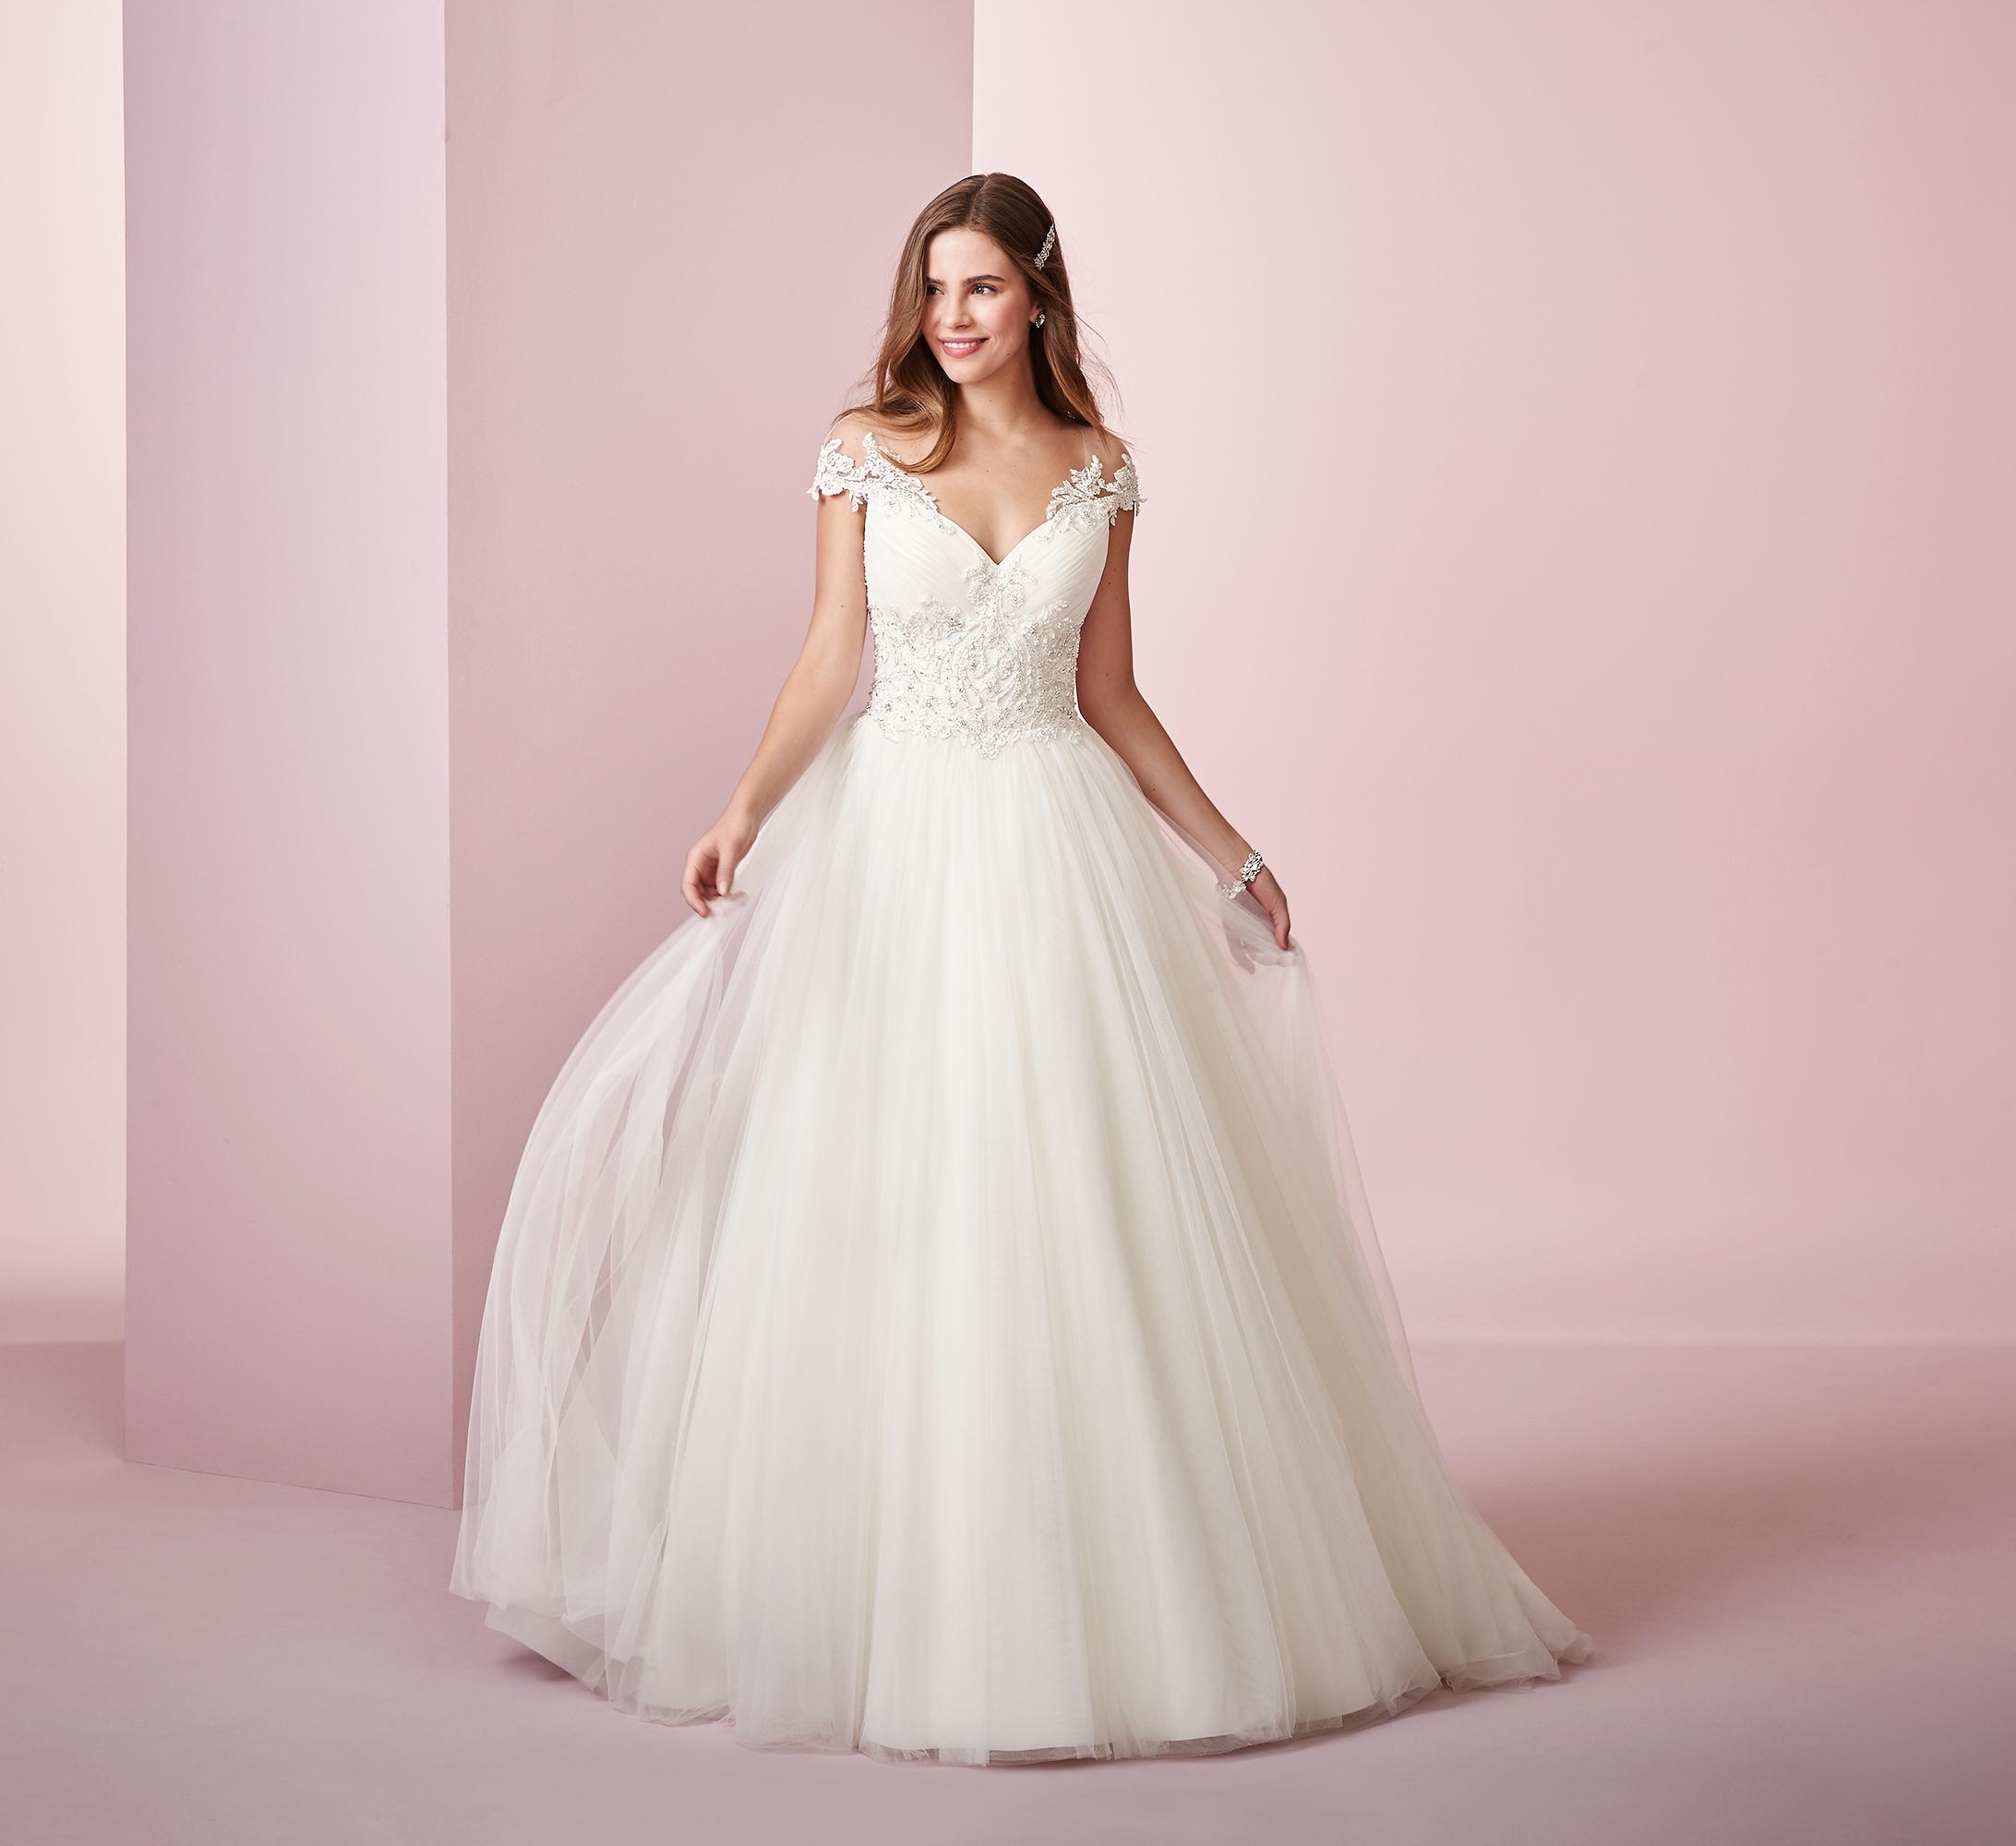 Rebecca Ingram wedding dress spring 2019 ball gown off the shoulder tulle